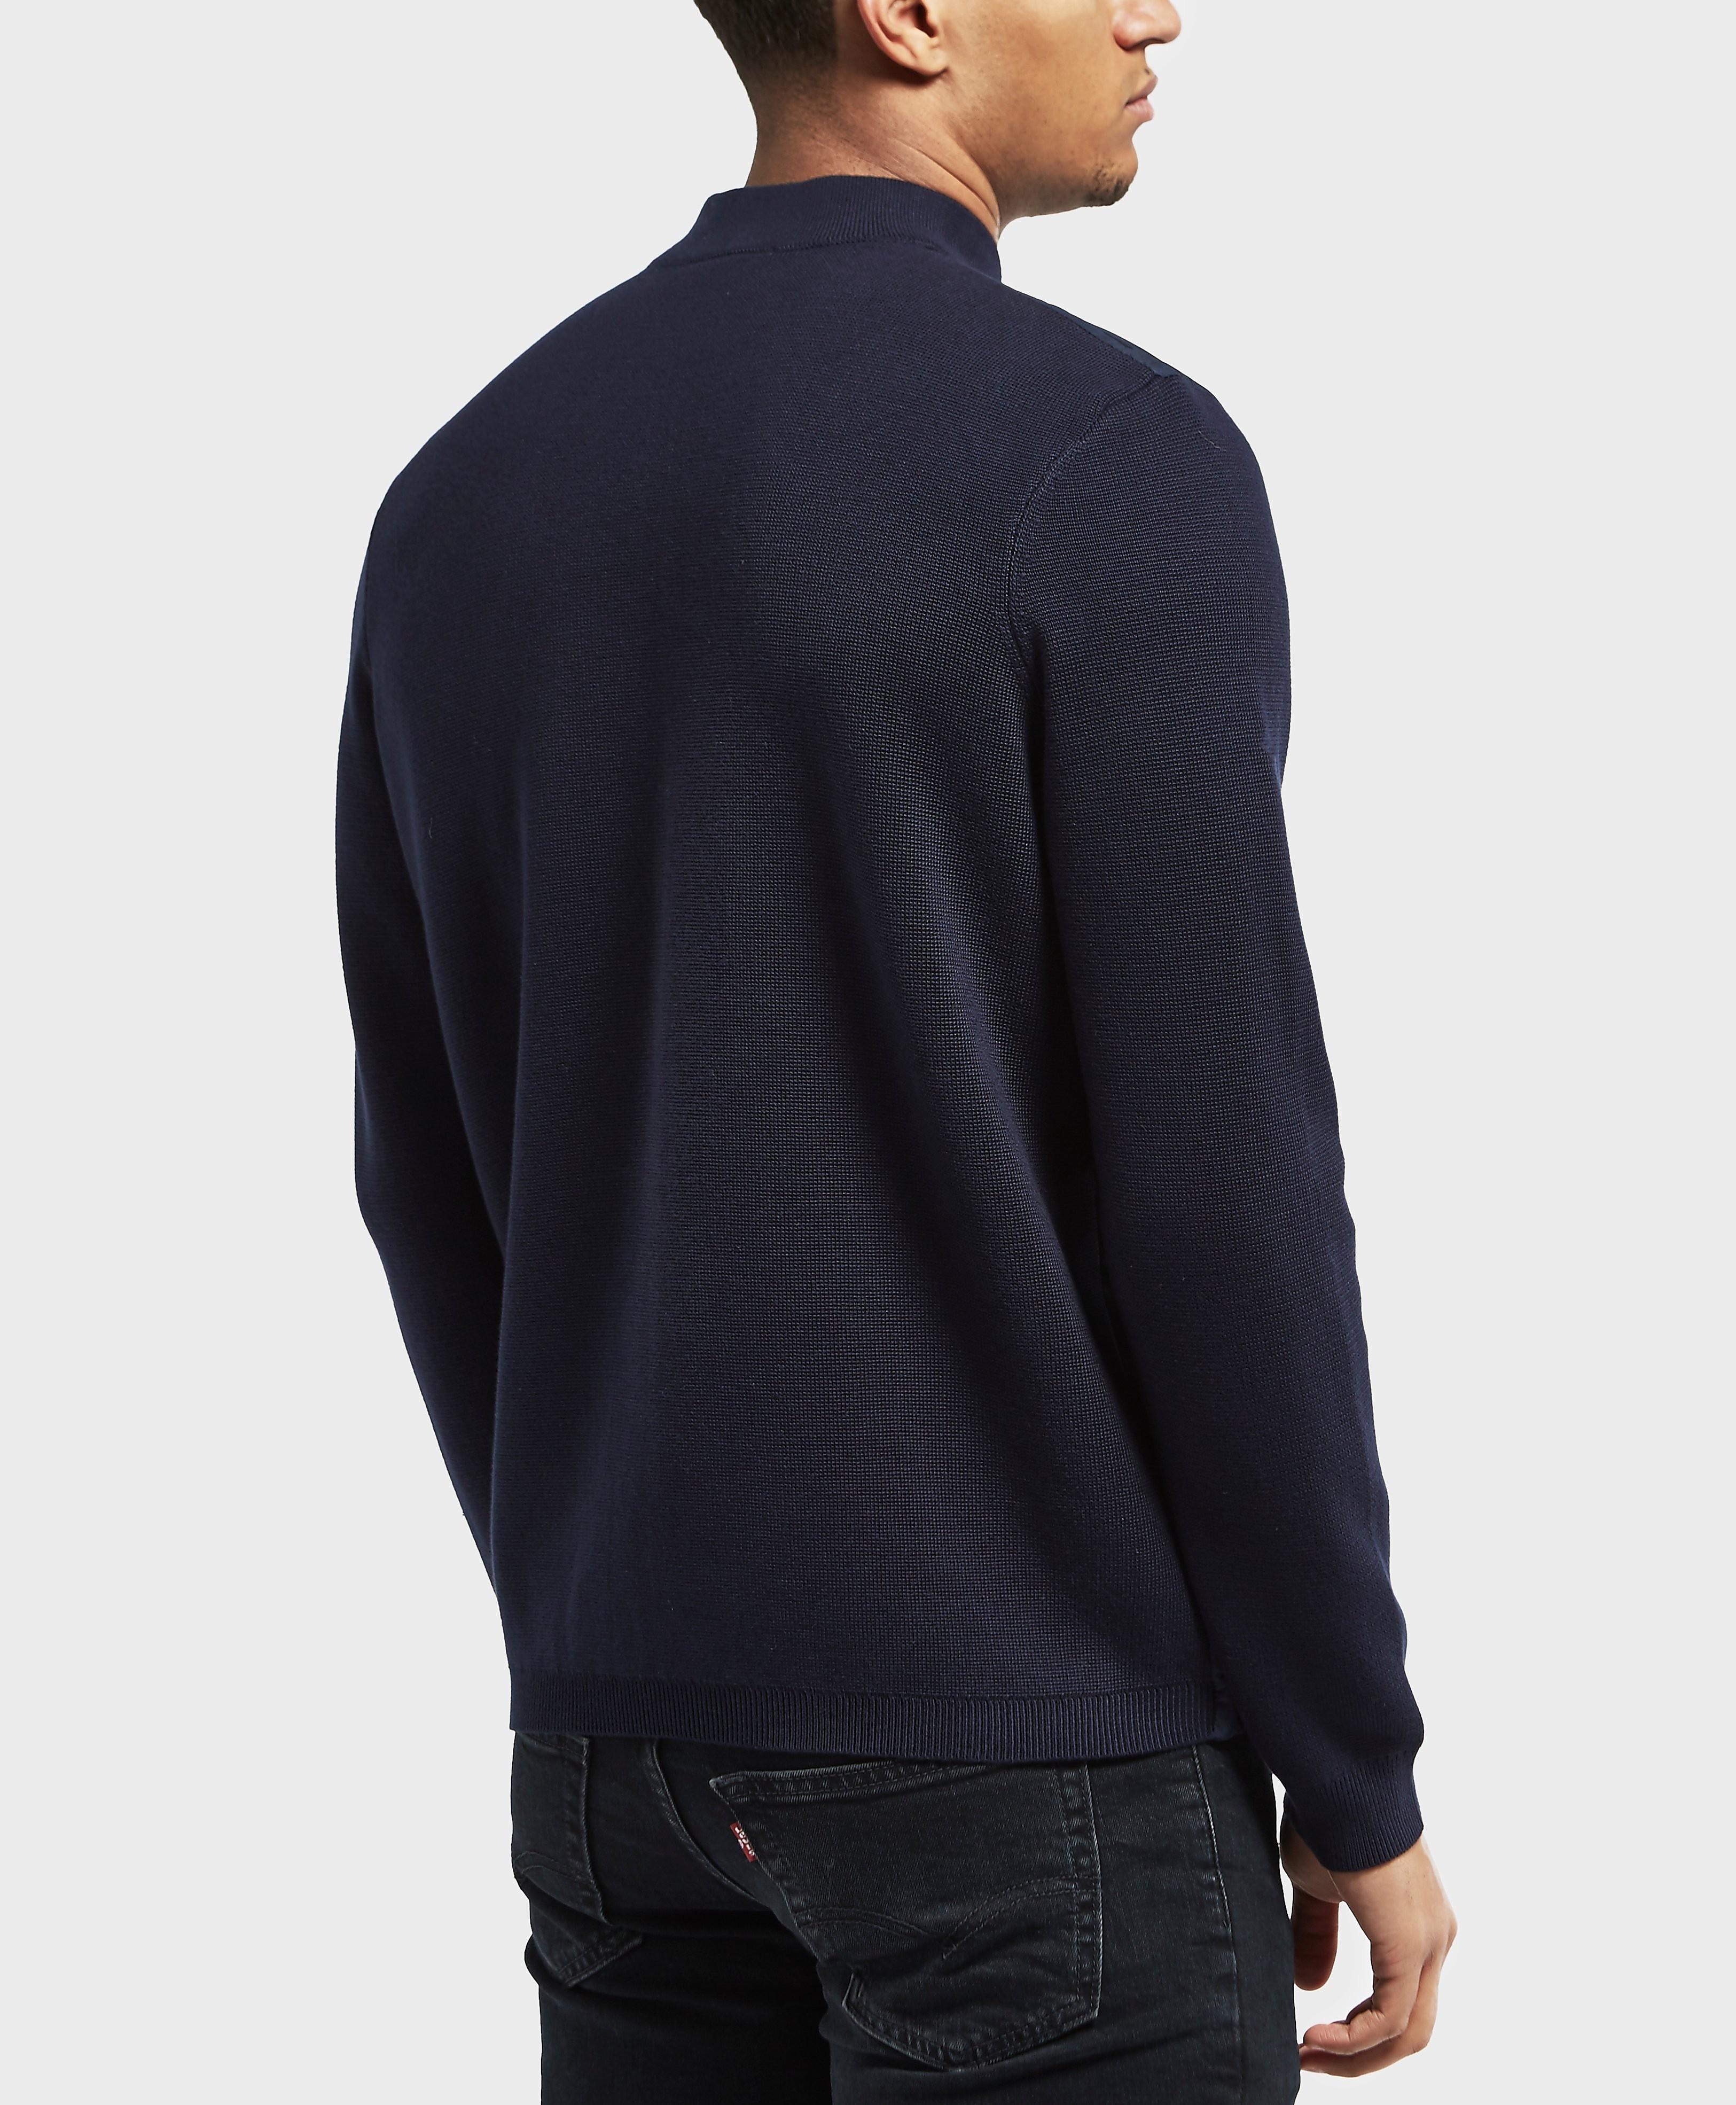 Lacoste Zip Through Knit Jumper